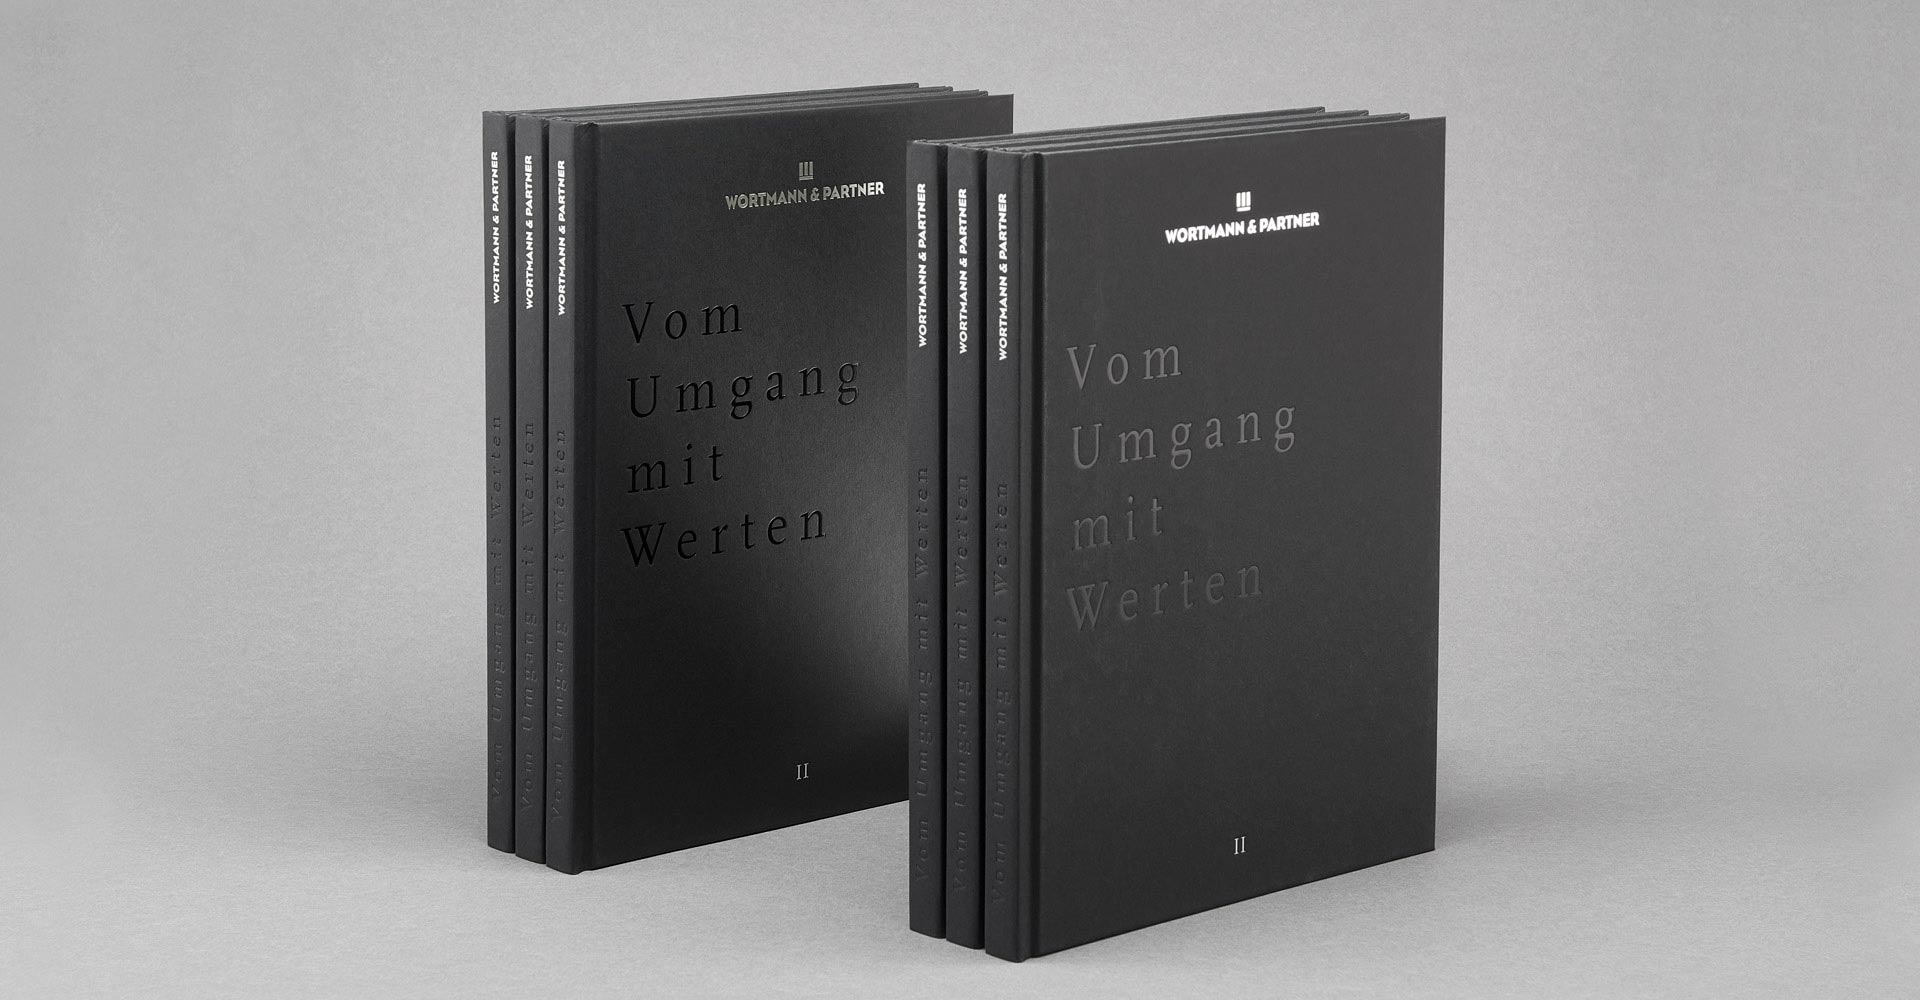 wortmann & partner